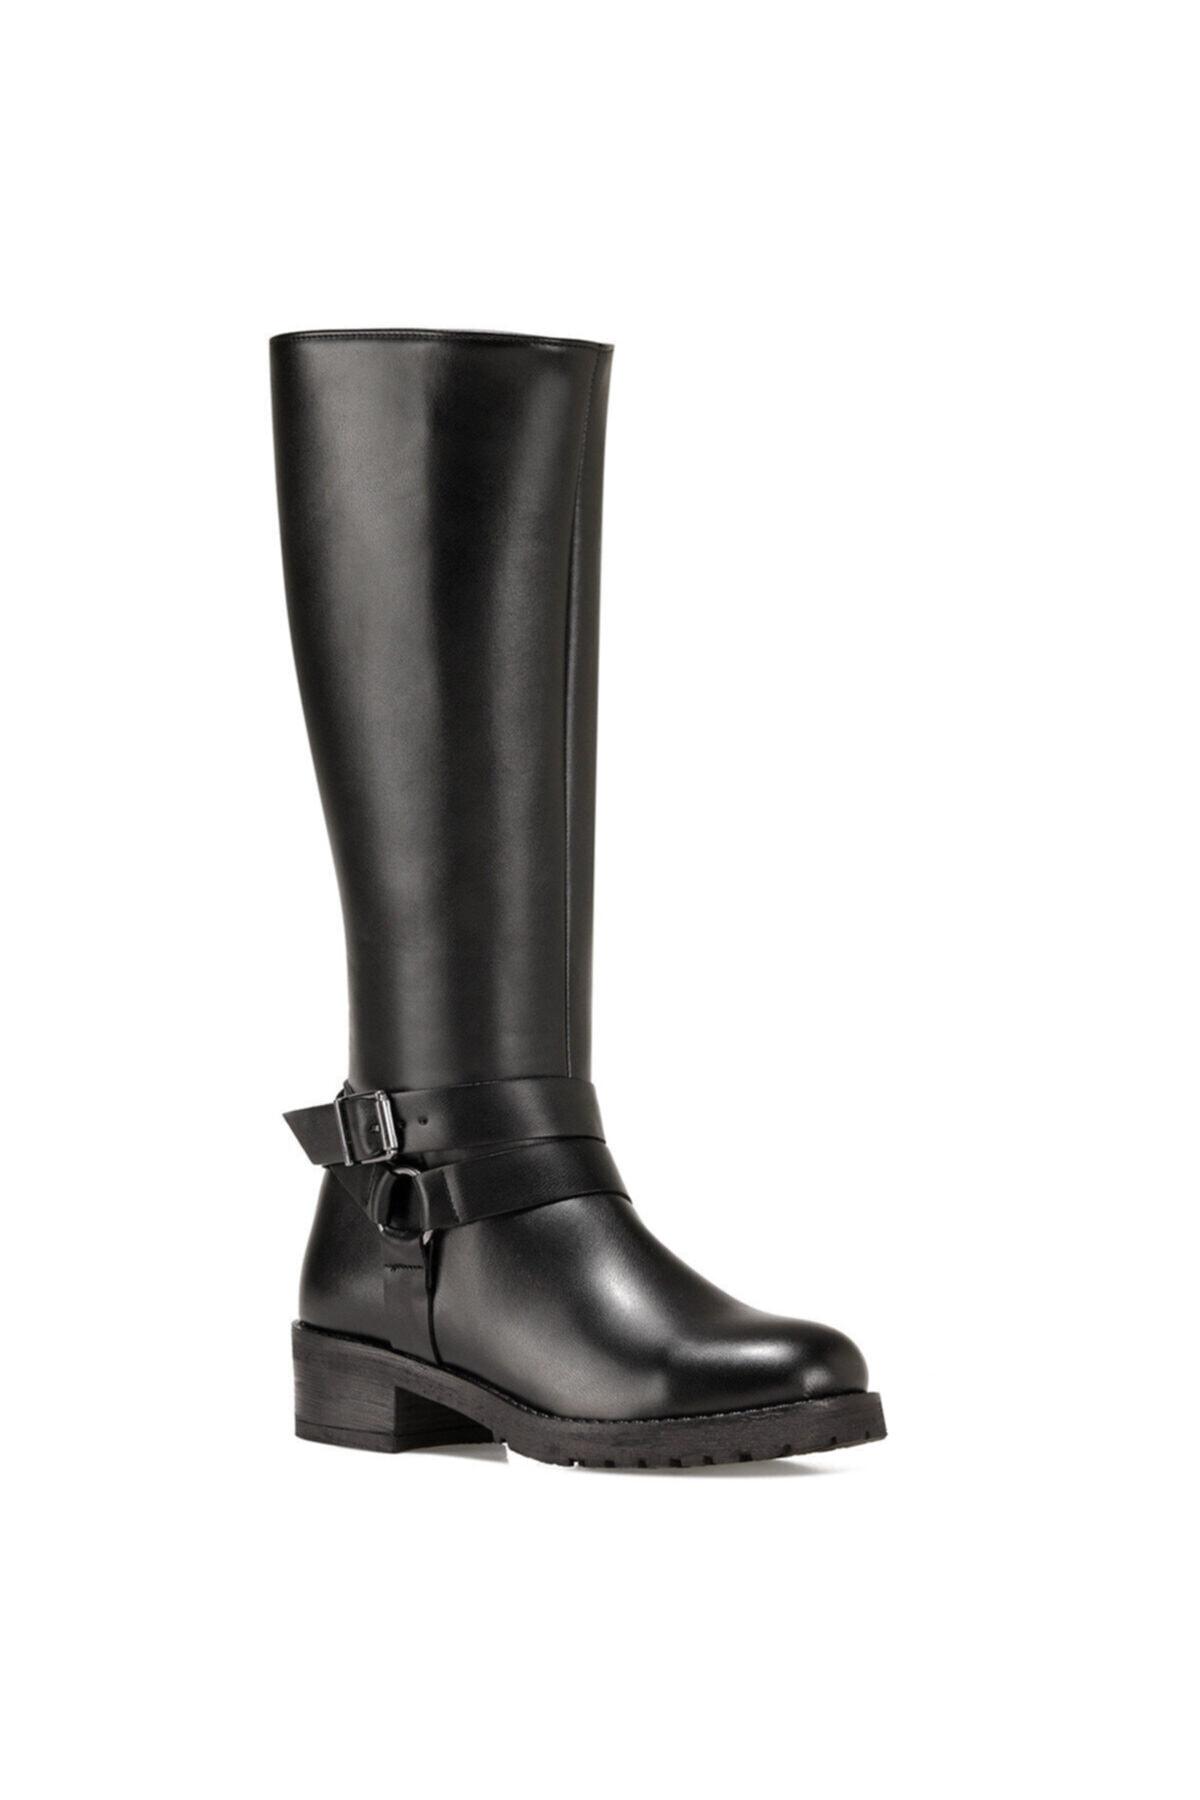 Nine West PASOV Siyah Kadın Çizme 100555960 2